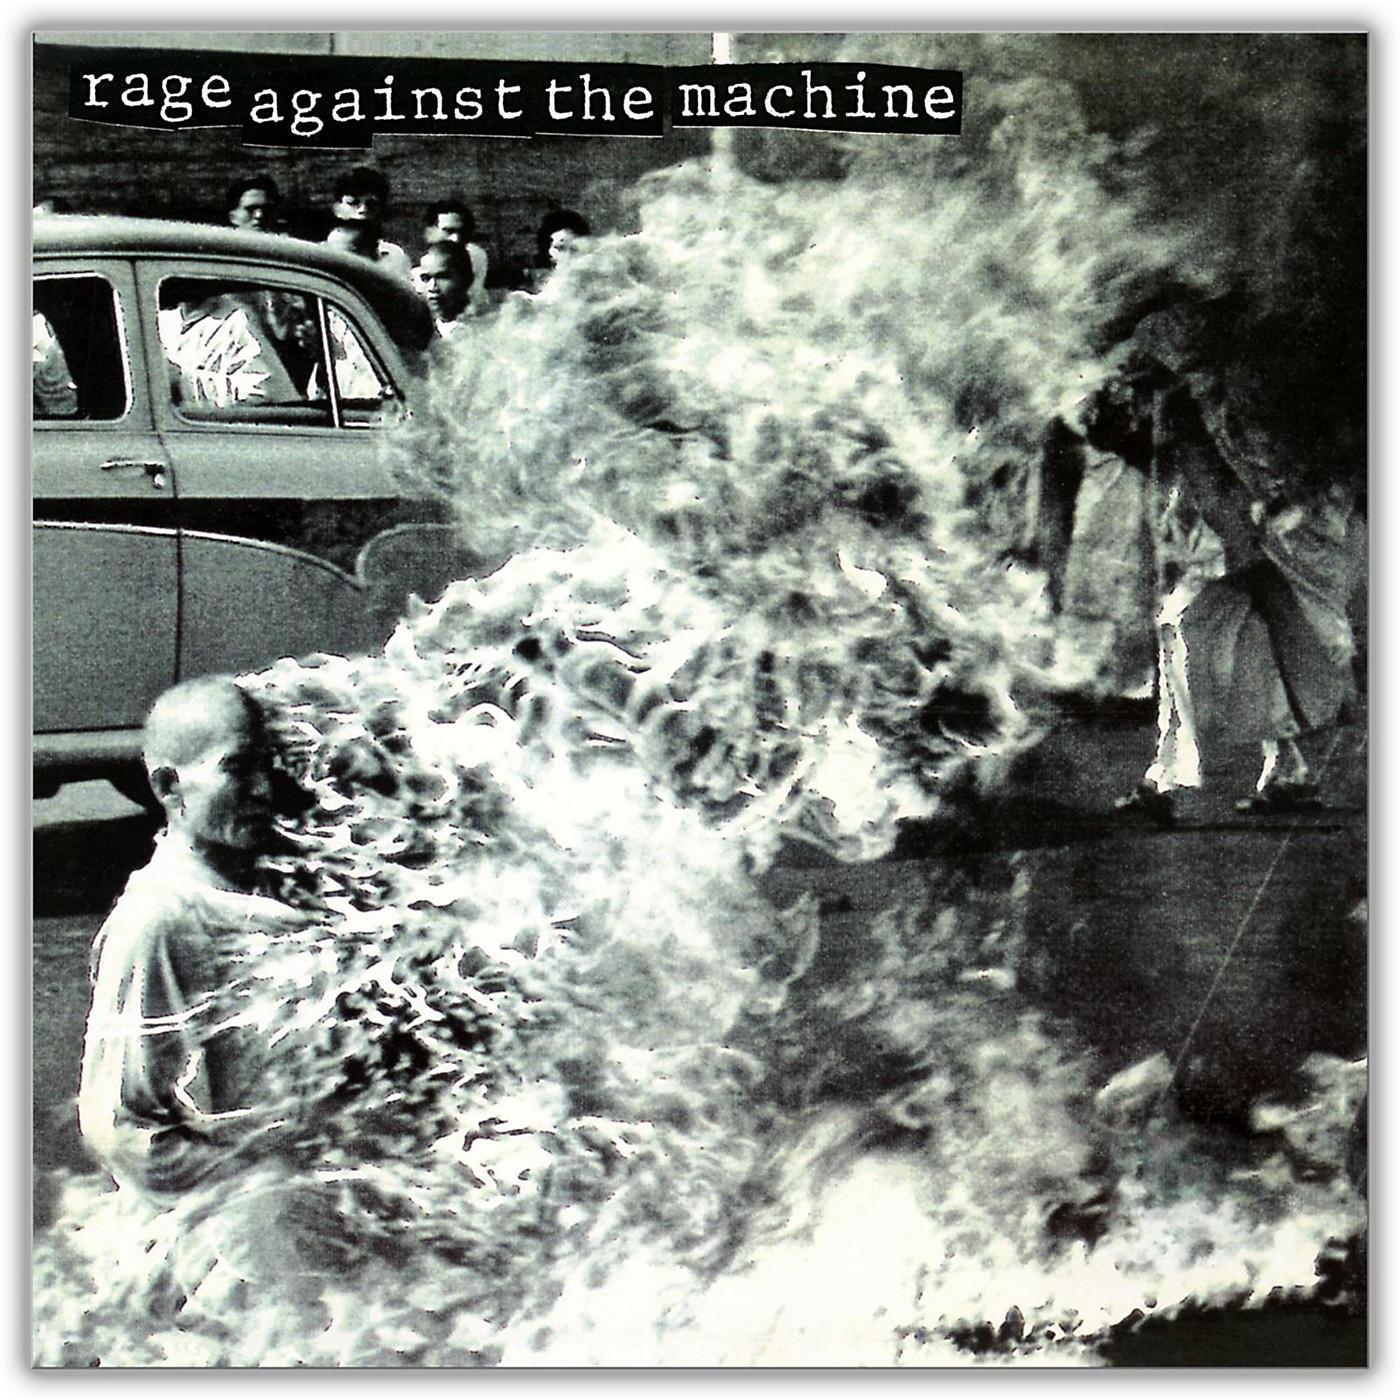 Sony Rage Against the Machine - Rage Against the Machine Vinyl LP thumbnail